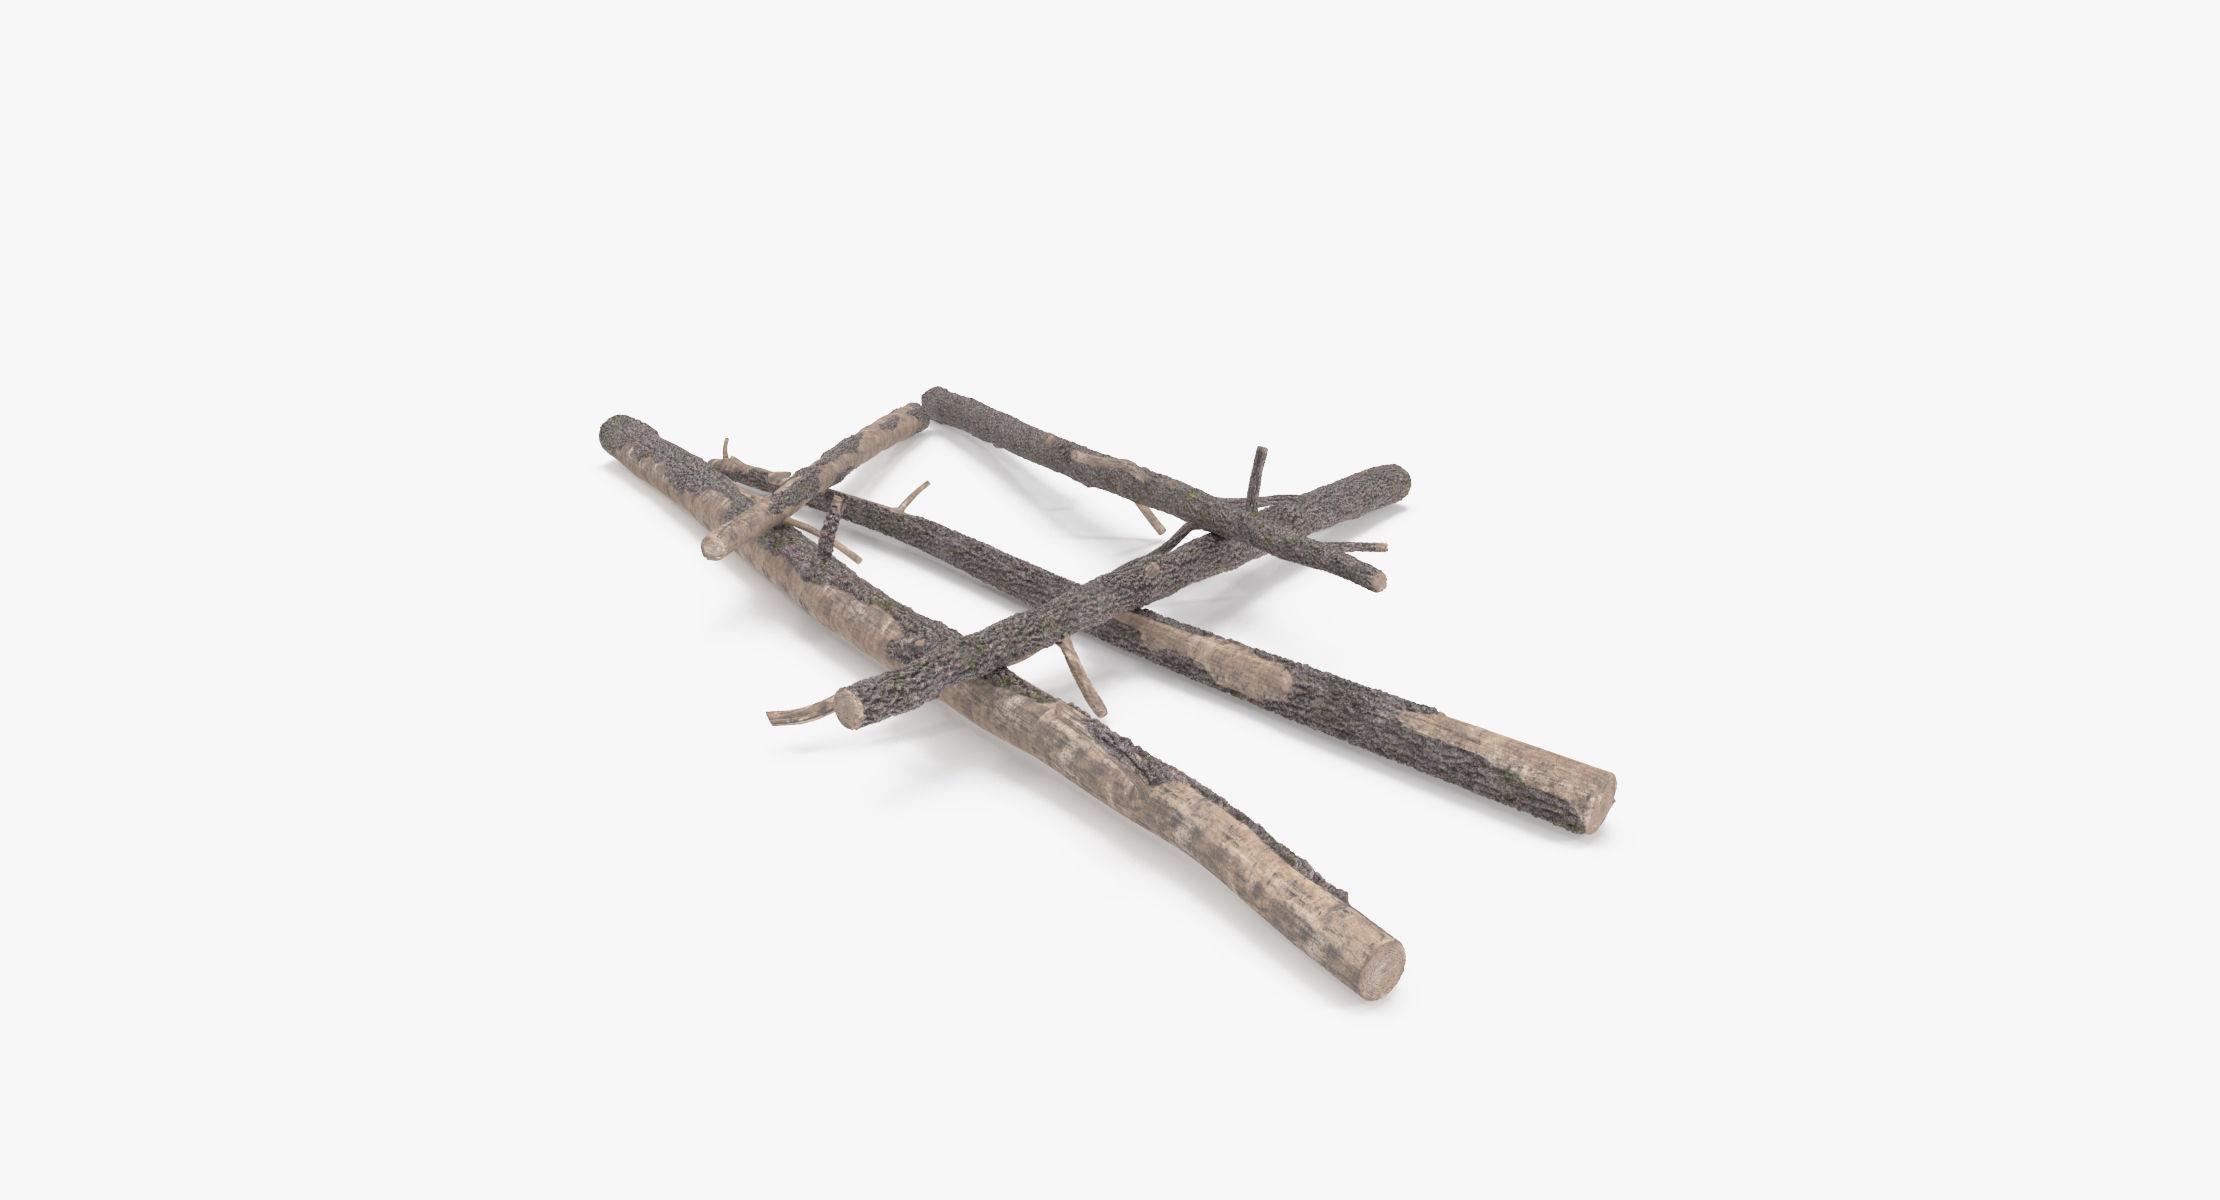 Fallen Log - Pine 01 - reel 1